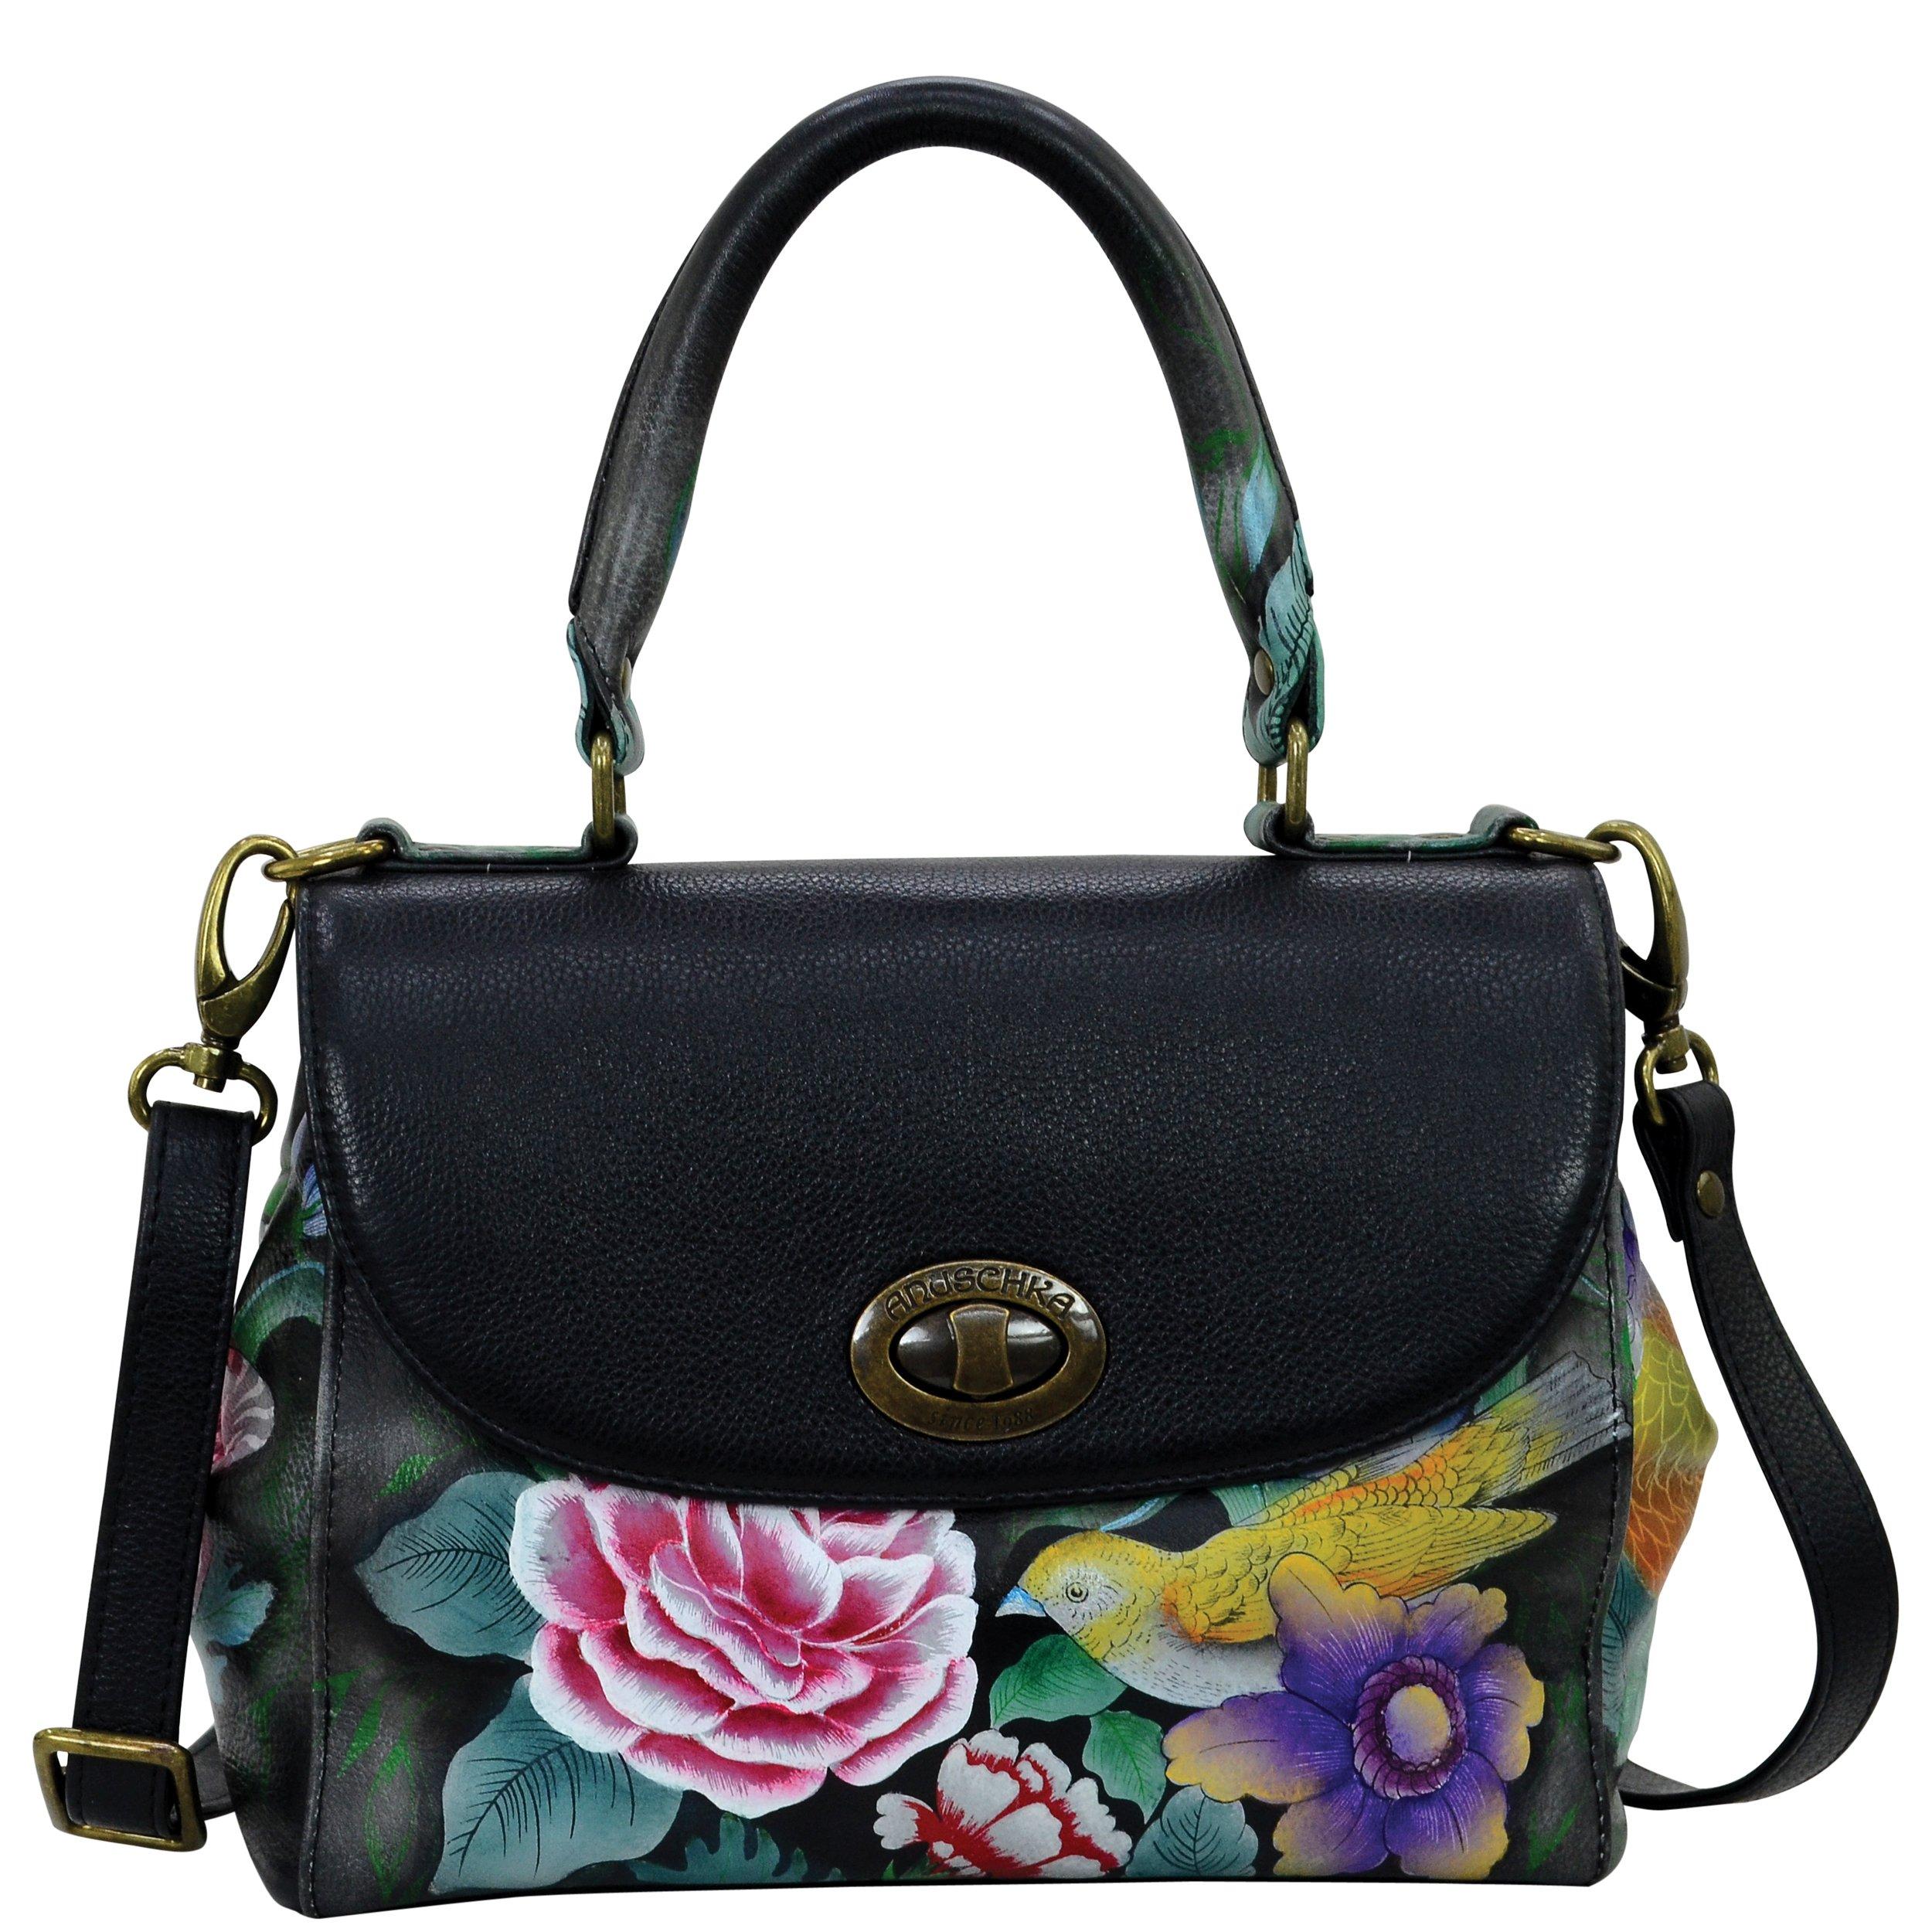 Anuschka Hand Painted Designer Leather Handbag- Christmas gifts for women-Medium Flap Satchel ( Vintage Bouquet 624 VBQ )